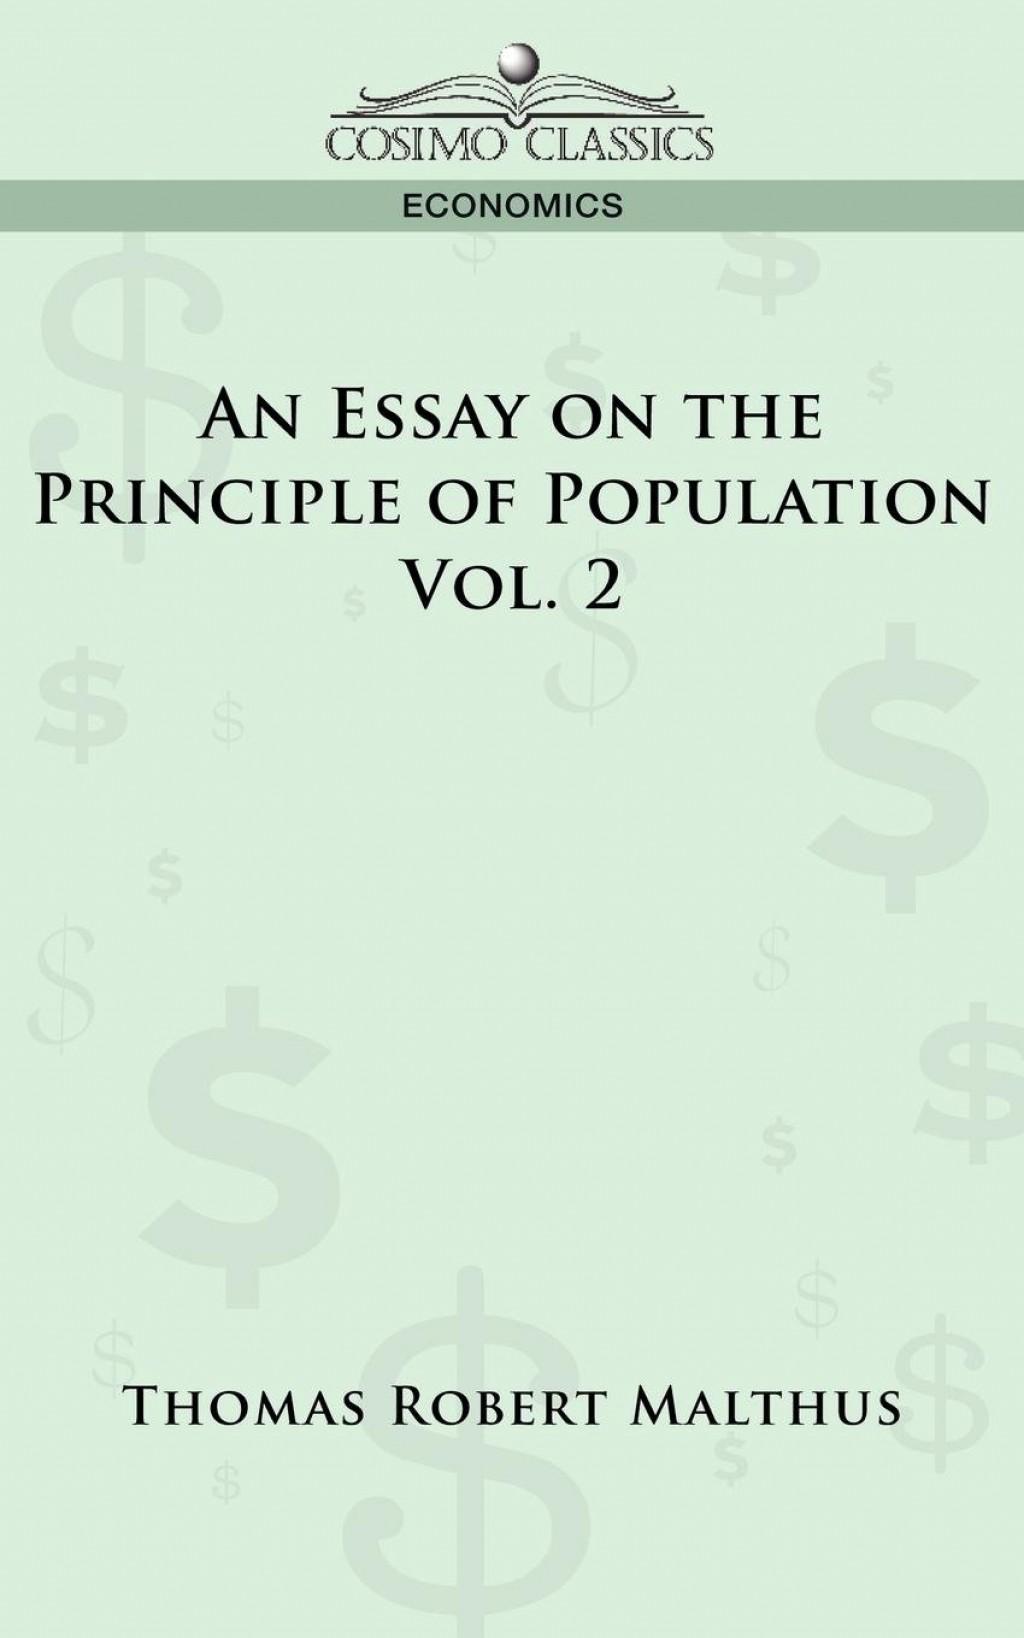 009 Essay On The Principle Of Population Example Singular Pdf By Thomas Malthus Main Idea Large